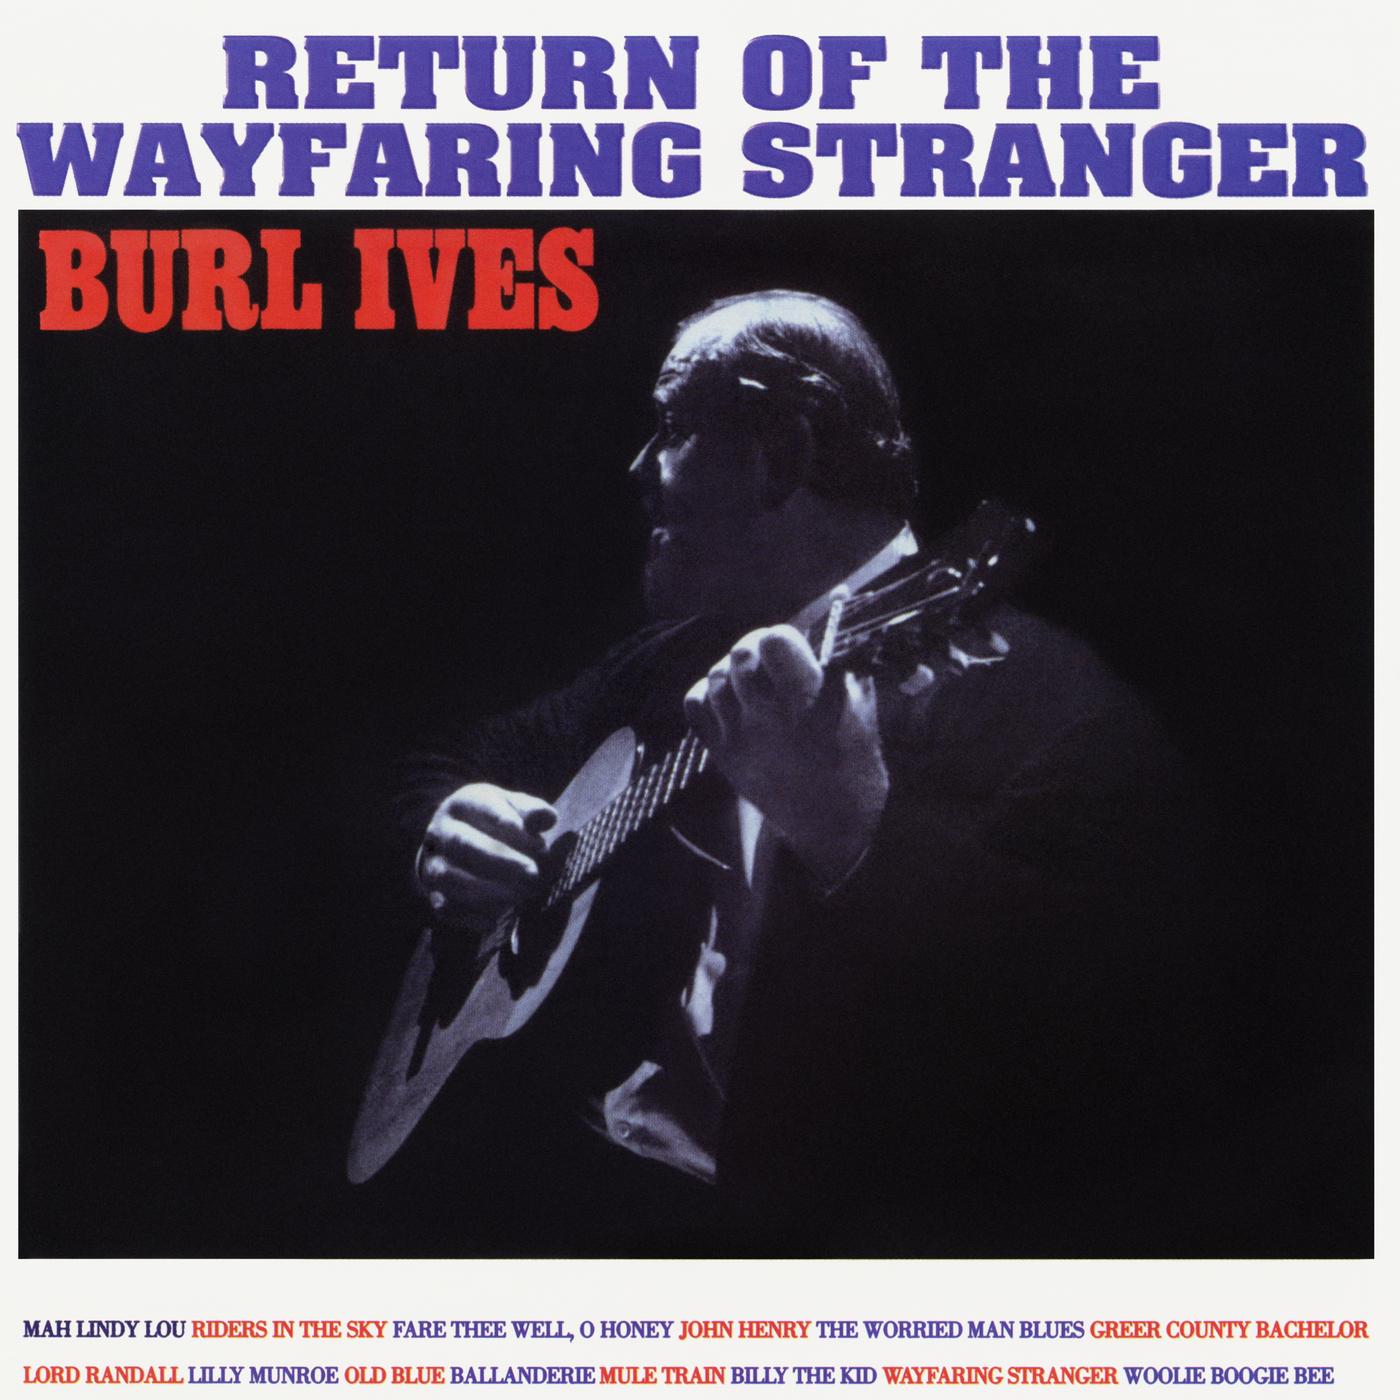 Return of the Wayfaring Stranger (Expanded Edition) - Burl Ives